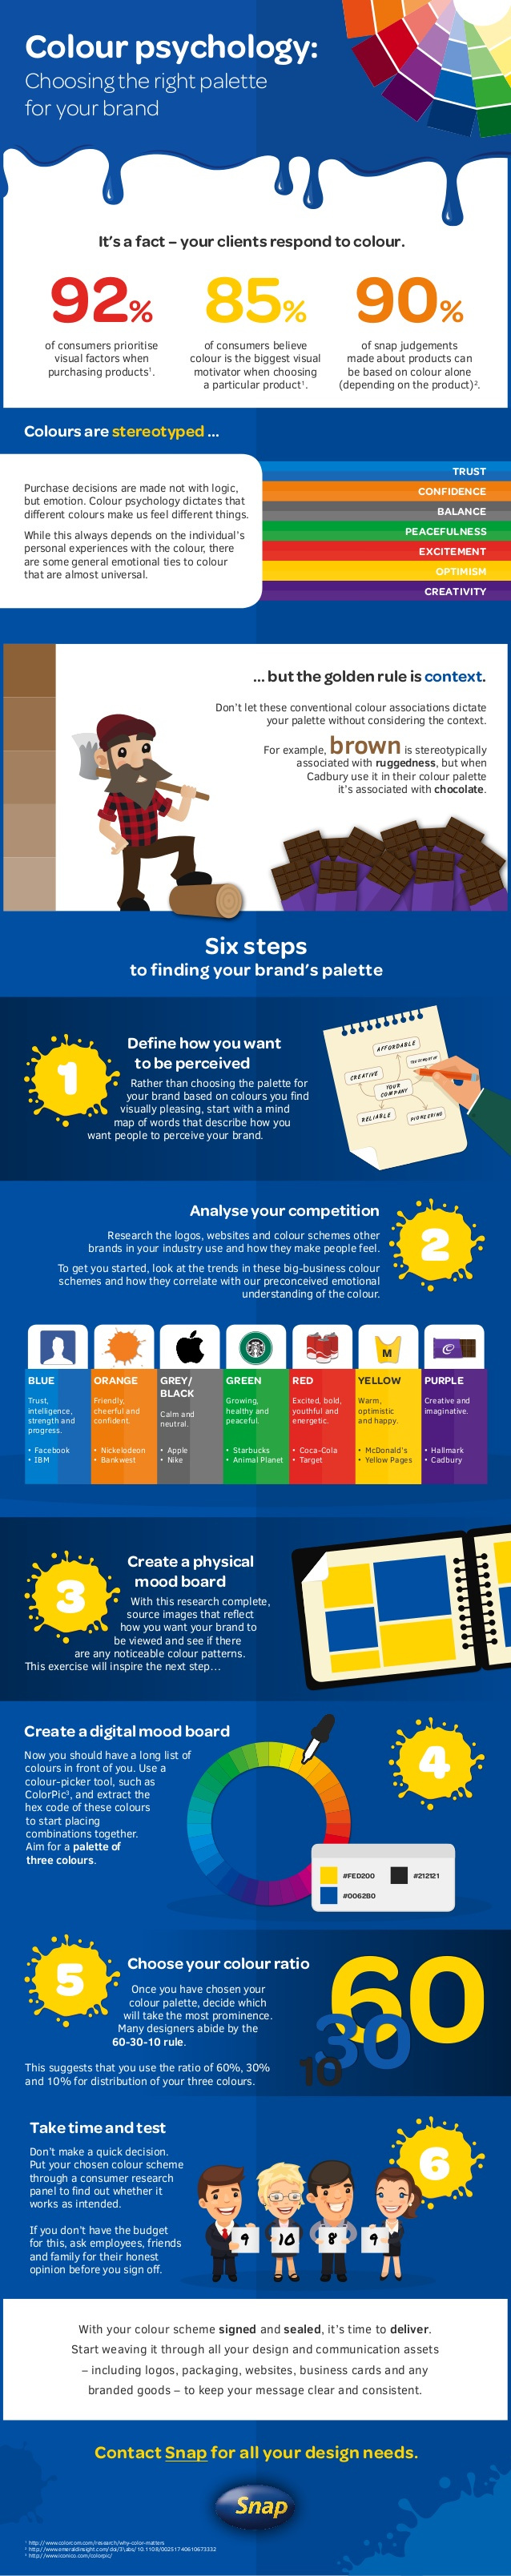 Colour Psychology Infographic Marketing Color Psychology Social Media Marketing Jobs Branding Infographic